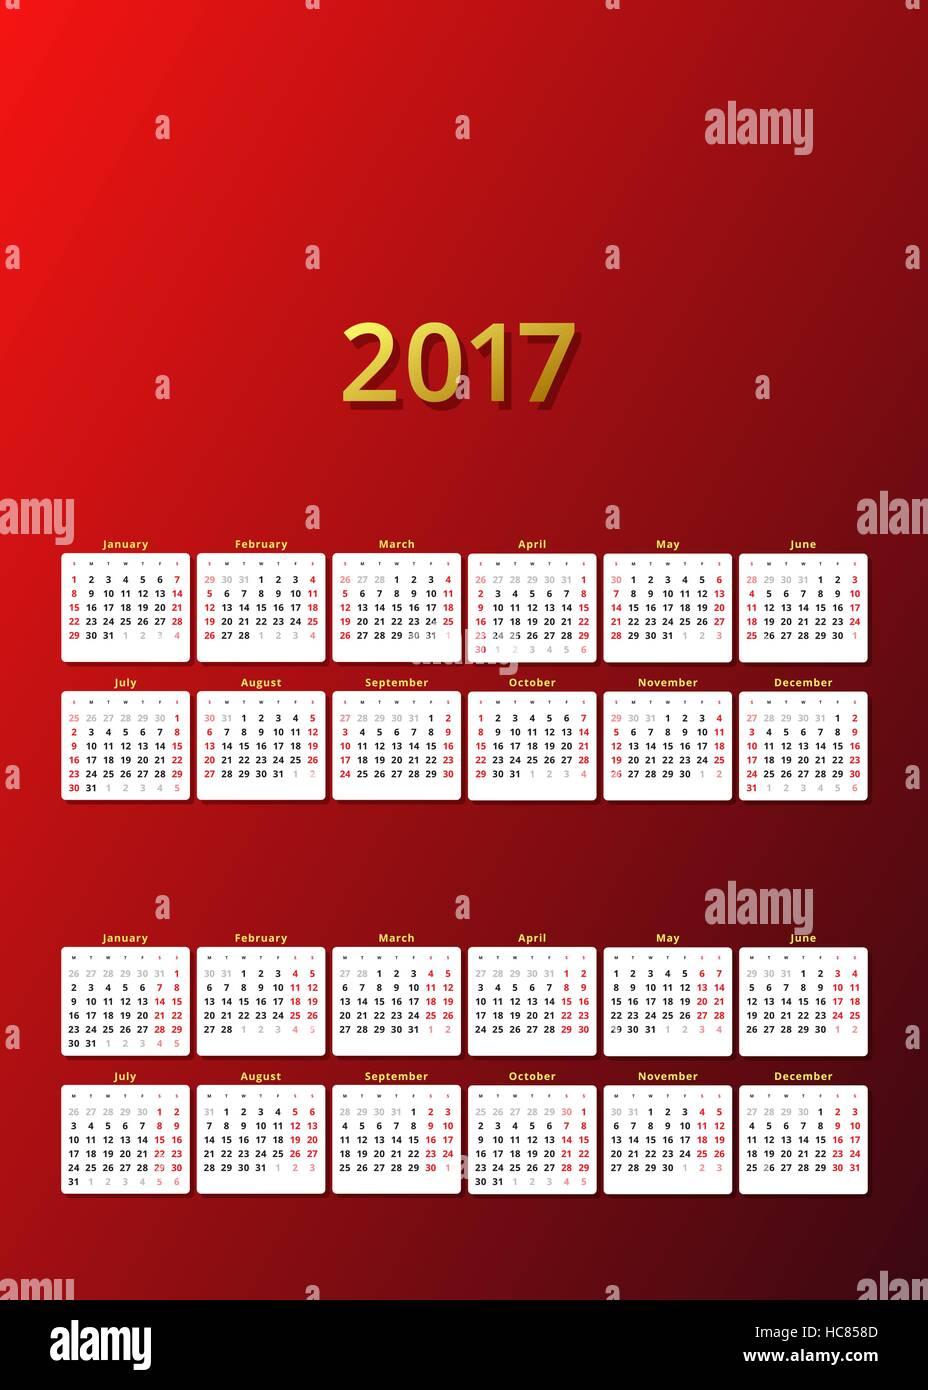 Monthly Planner Calendar August 2017 Stockfotos & Monthly Planner ...